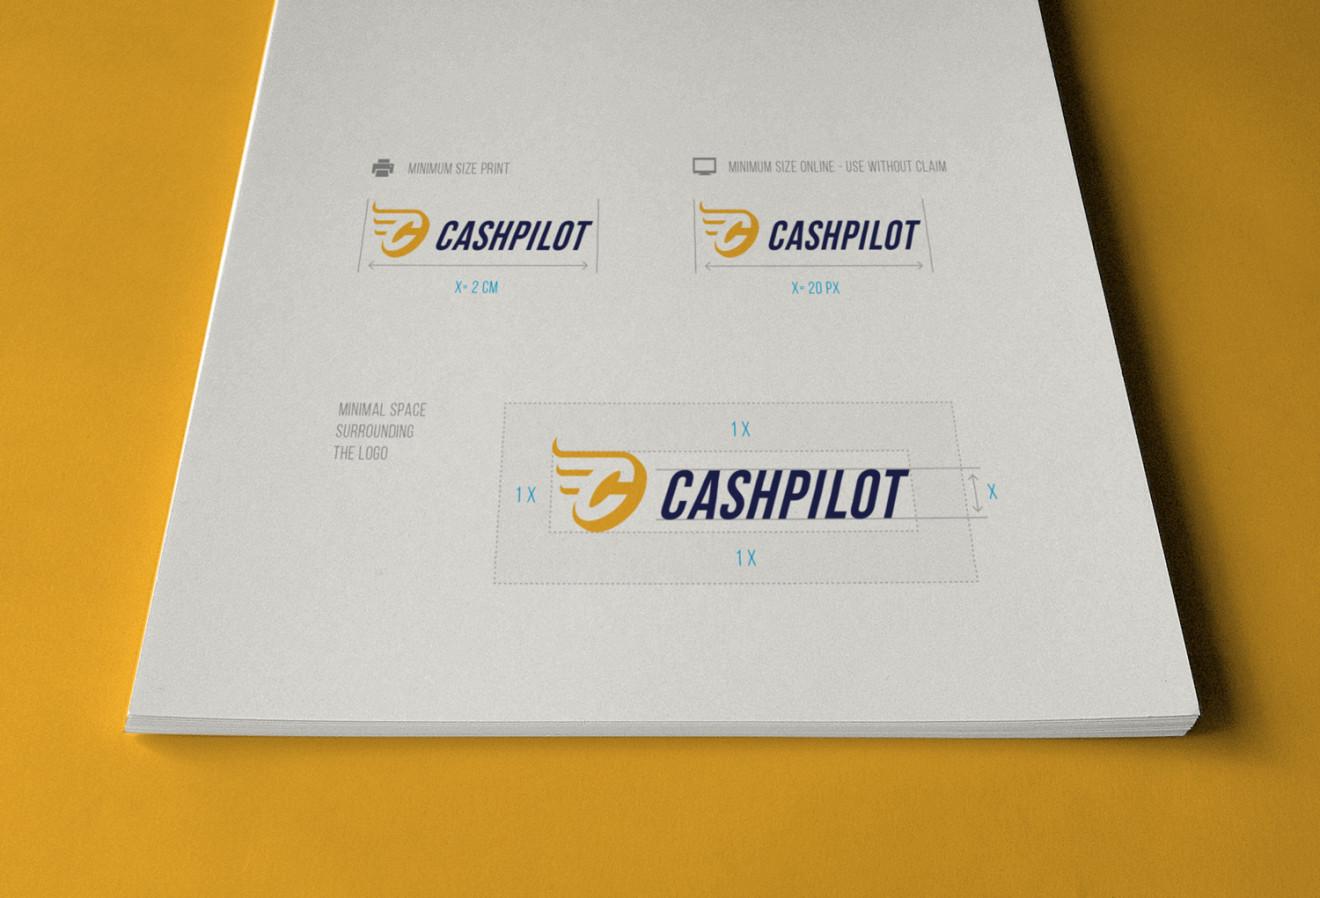 03_Cashpilot_minimumsize